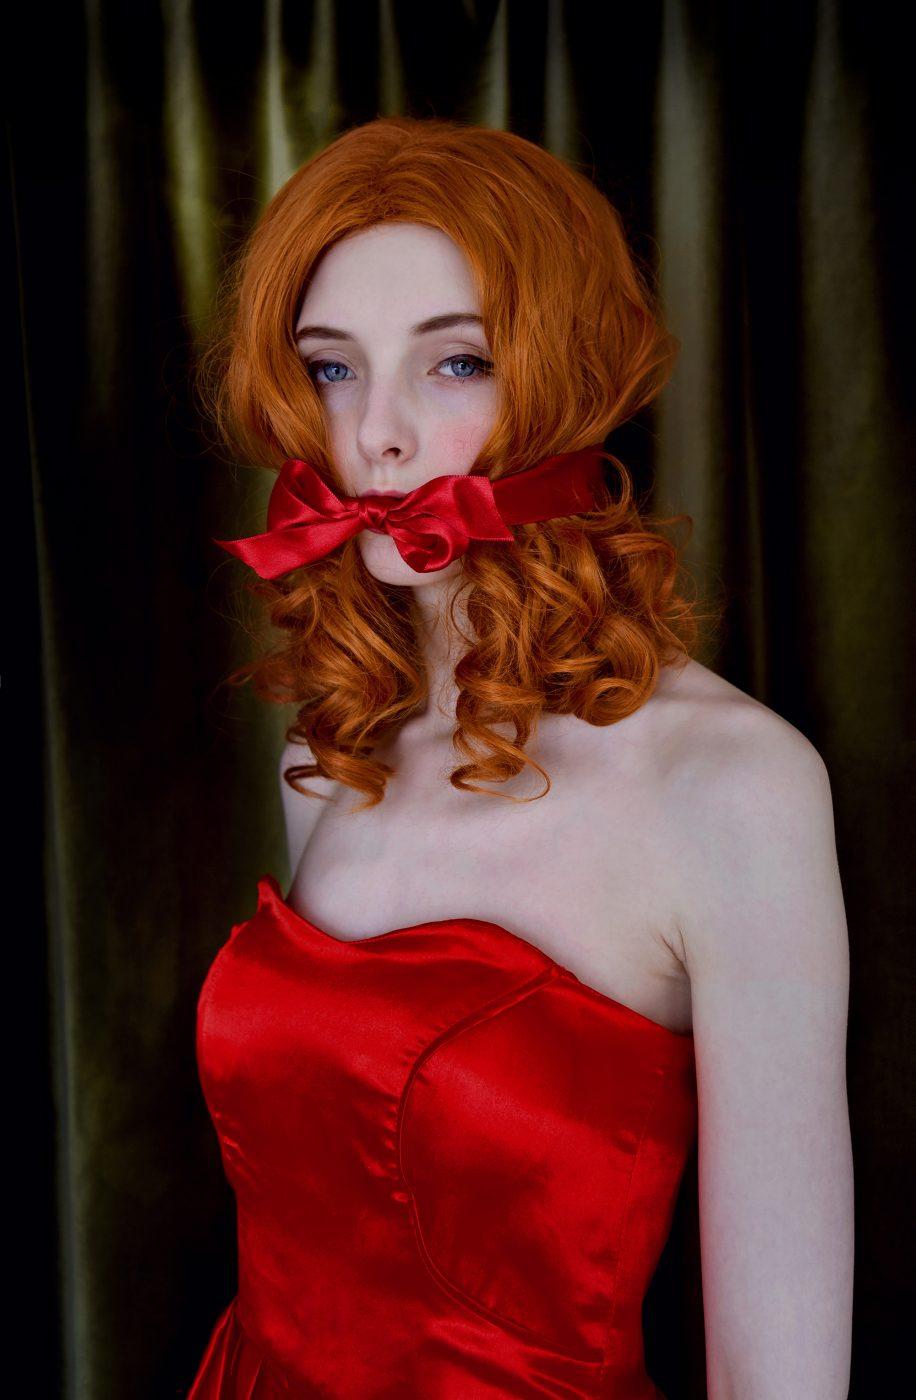 Pretty Bow by Vicky Martin